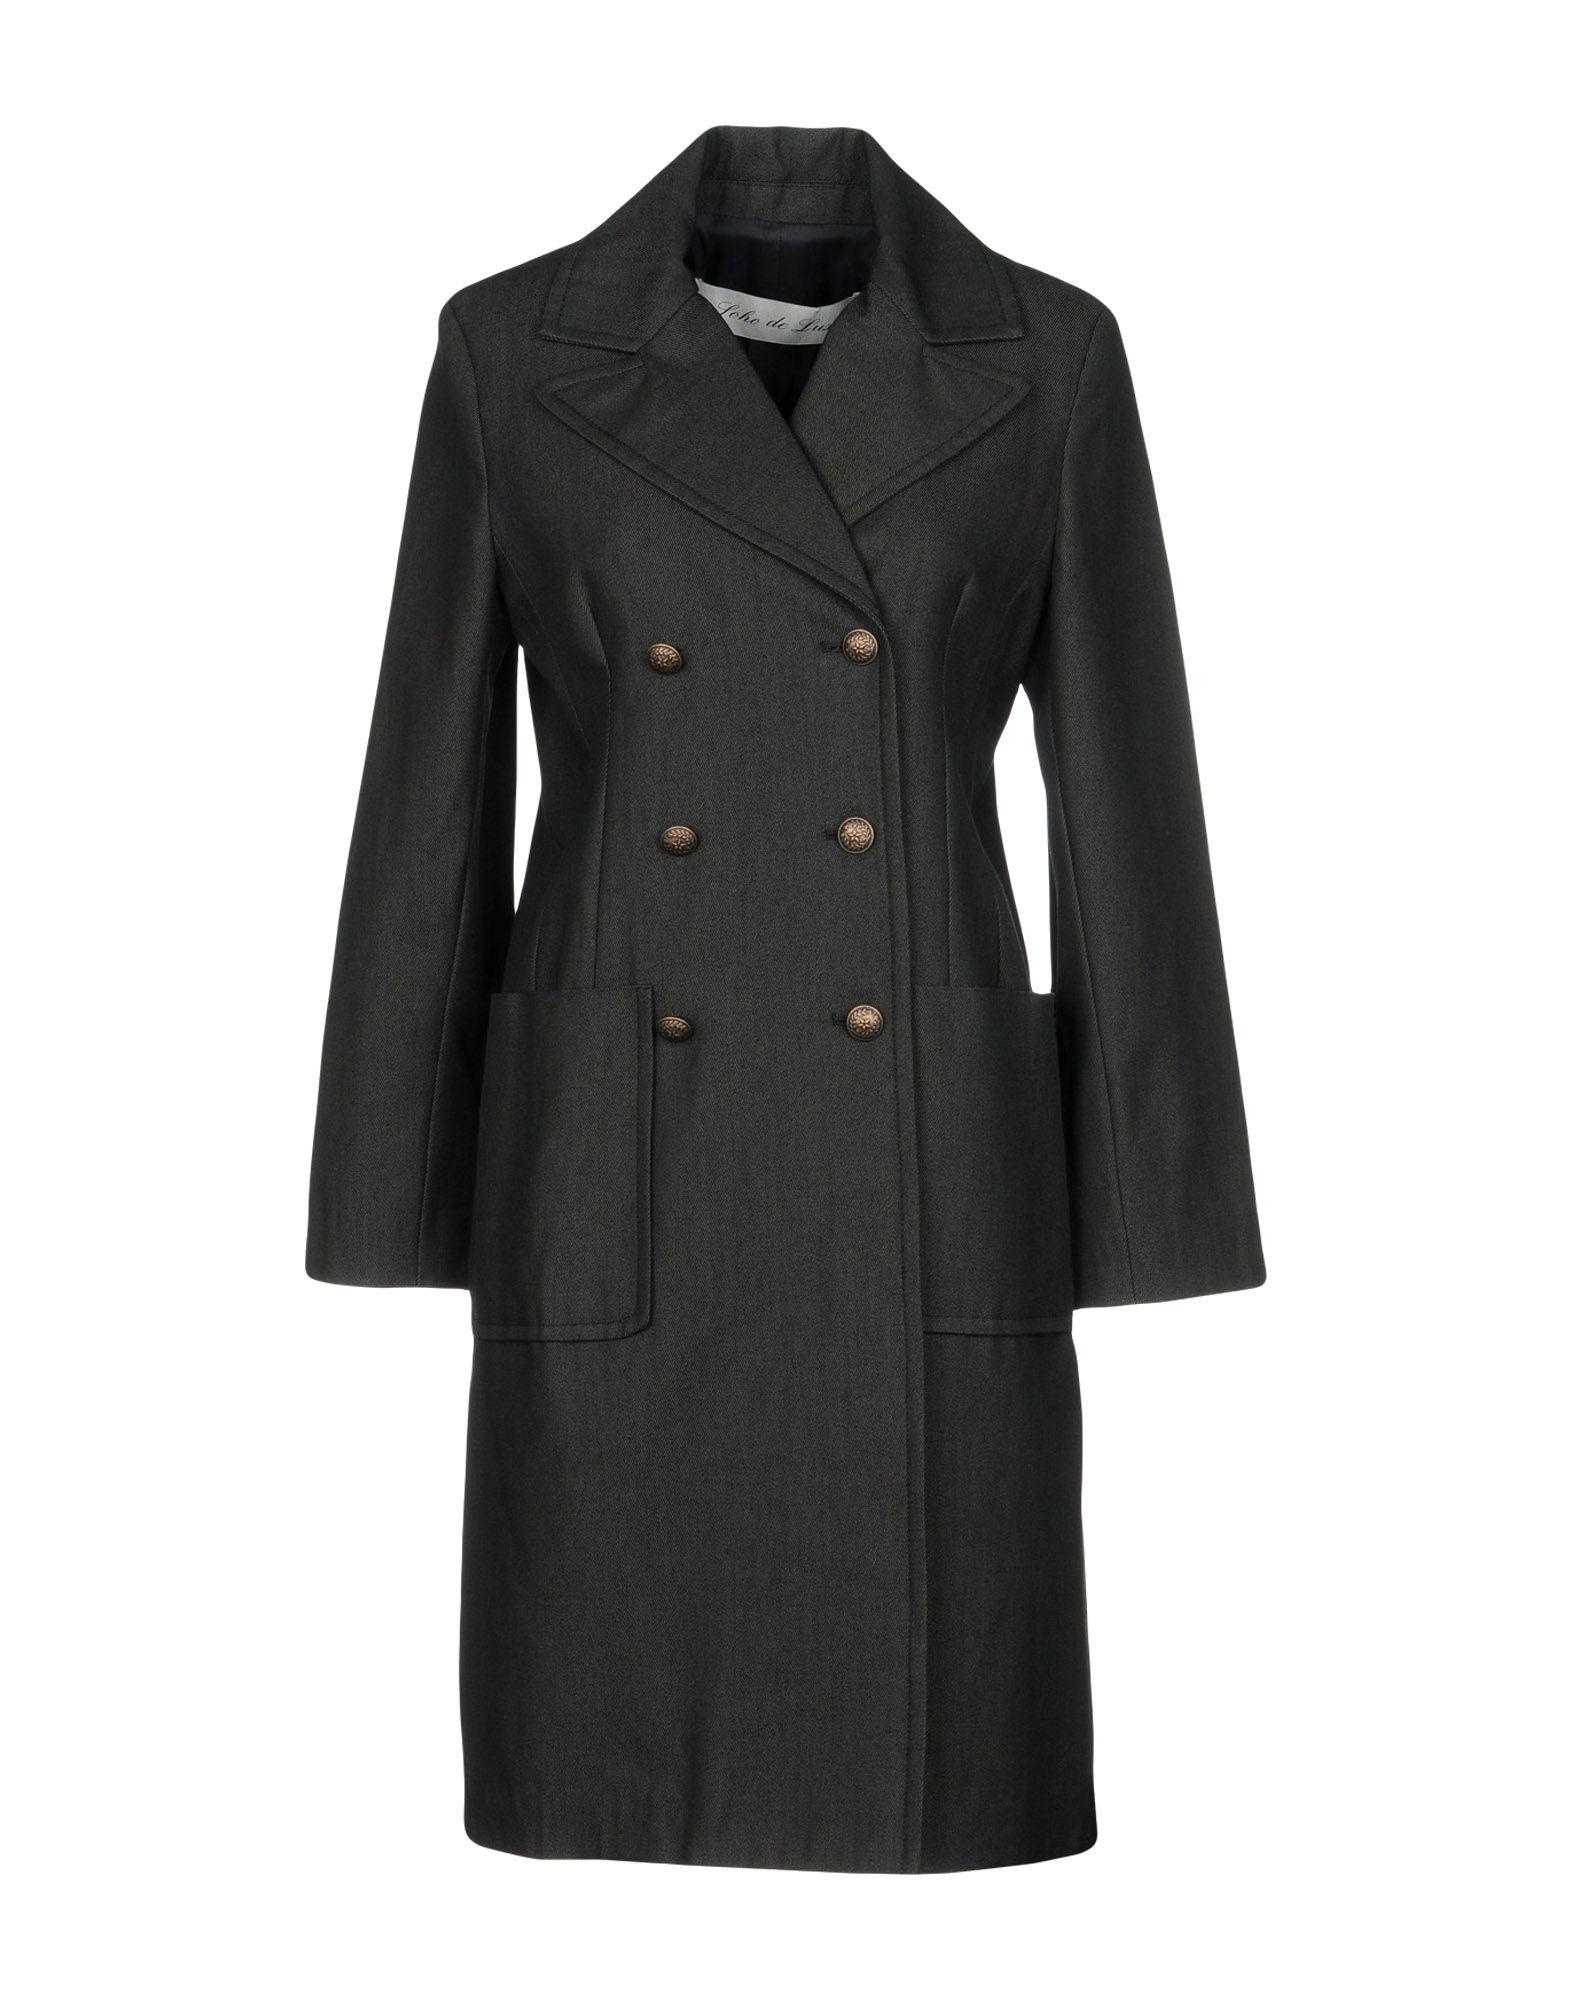 SOHO DE LUXE Легкое пальто пальто de salitto одежда непромокаемая